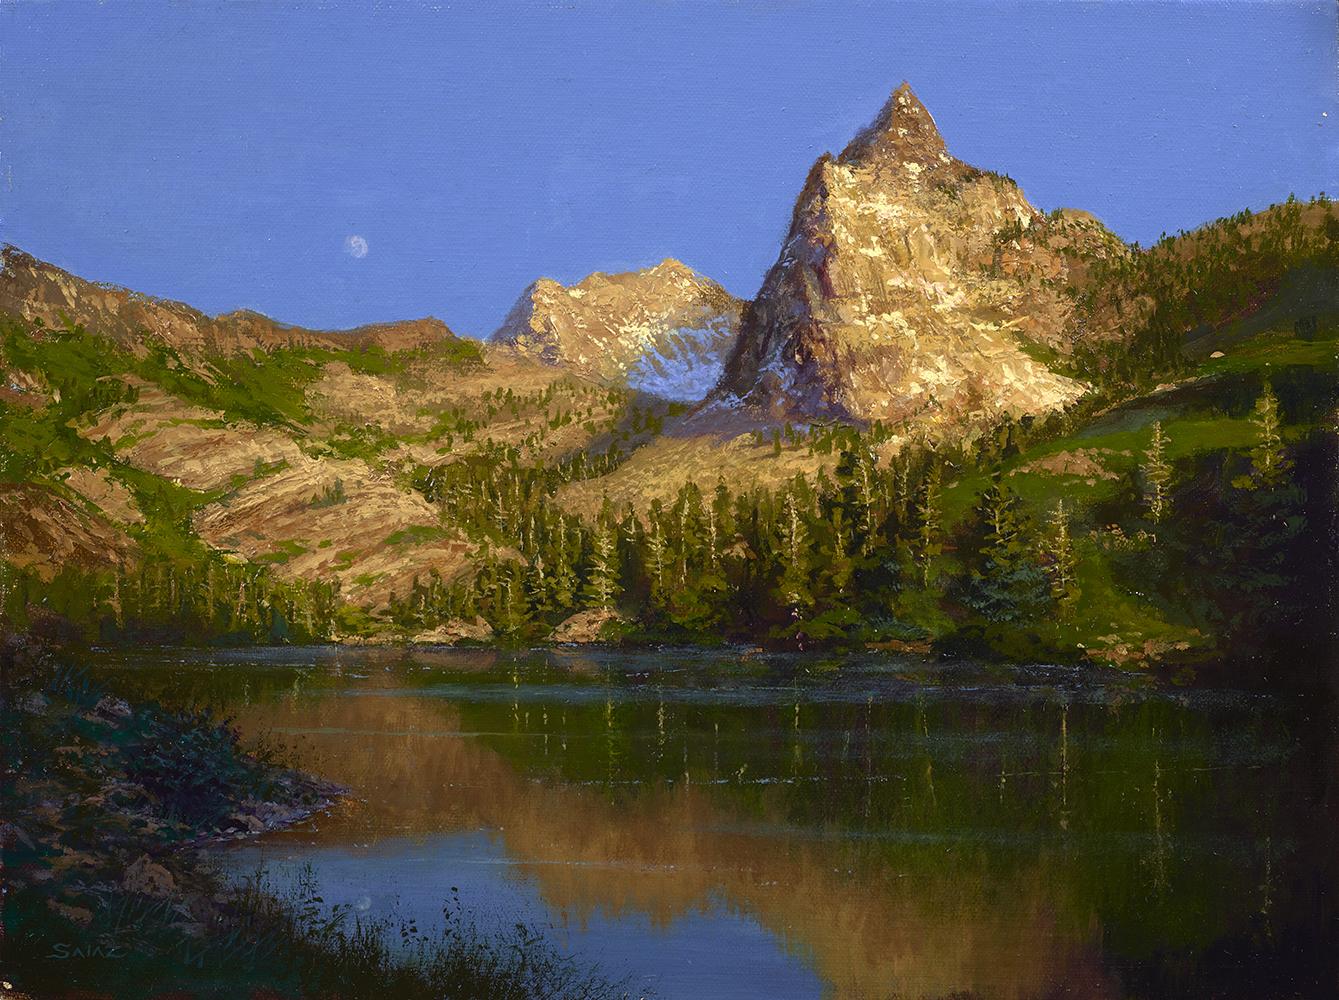 Moonrise over Sundial Peak, Utah